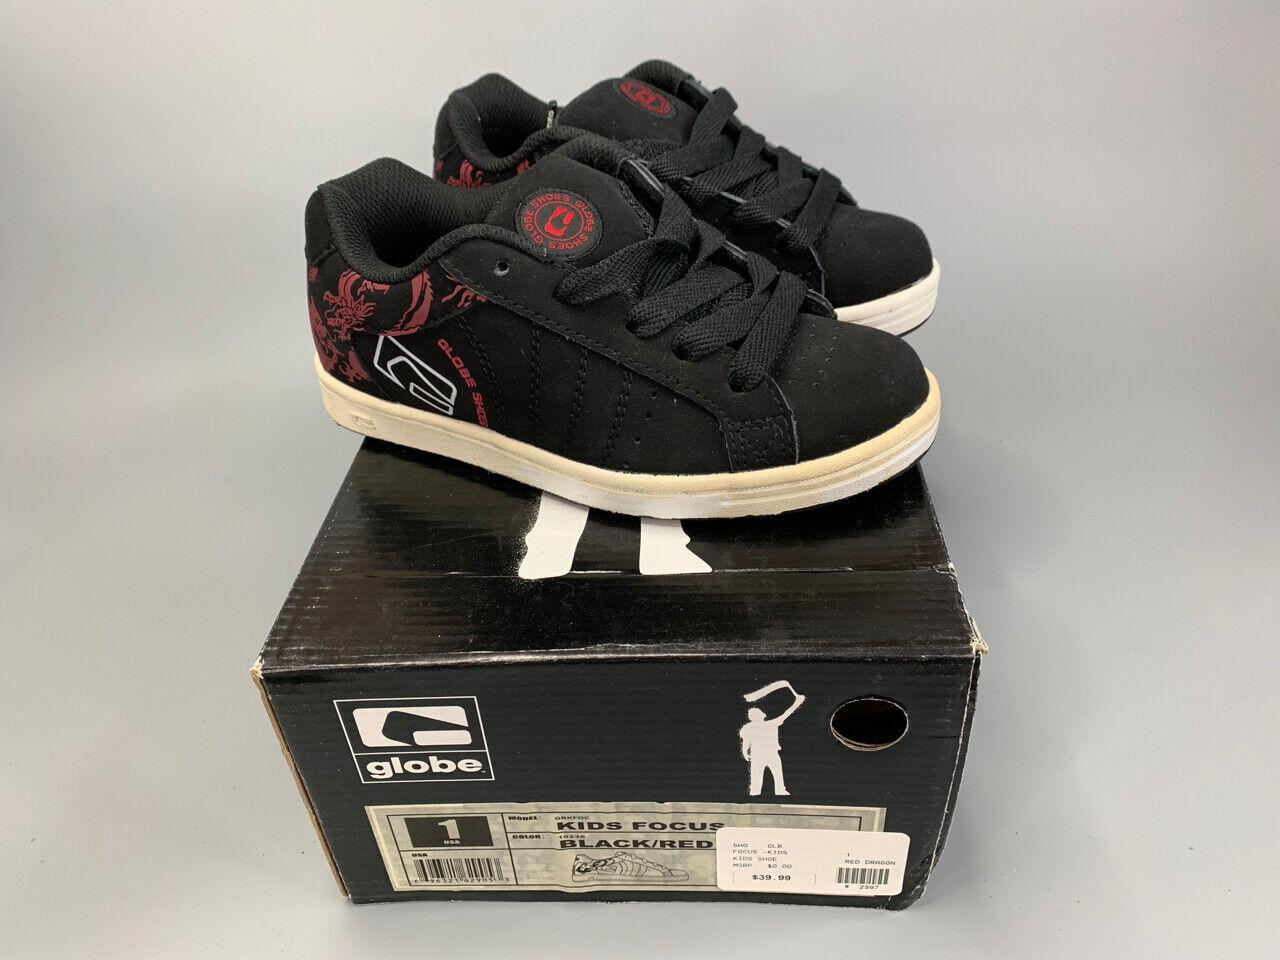 NEW GLOBE FOCUS KIDS Skateboard Skate Shoes Youth Size 1.0 N